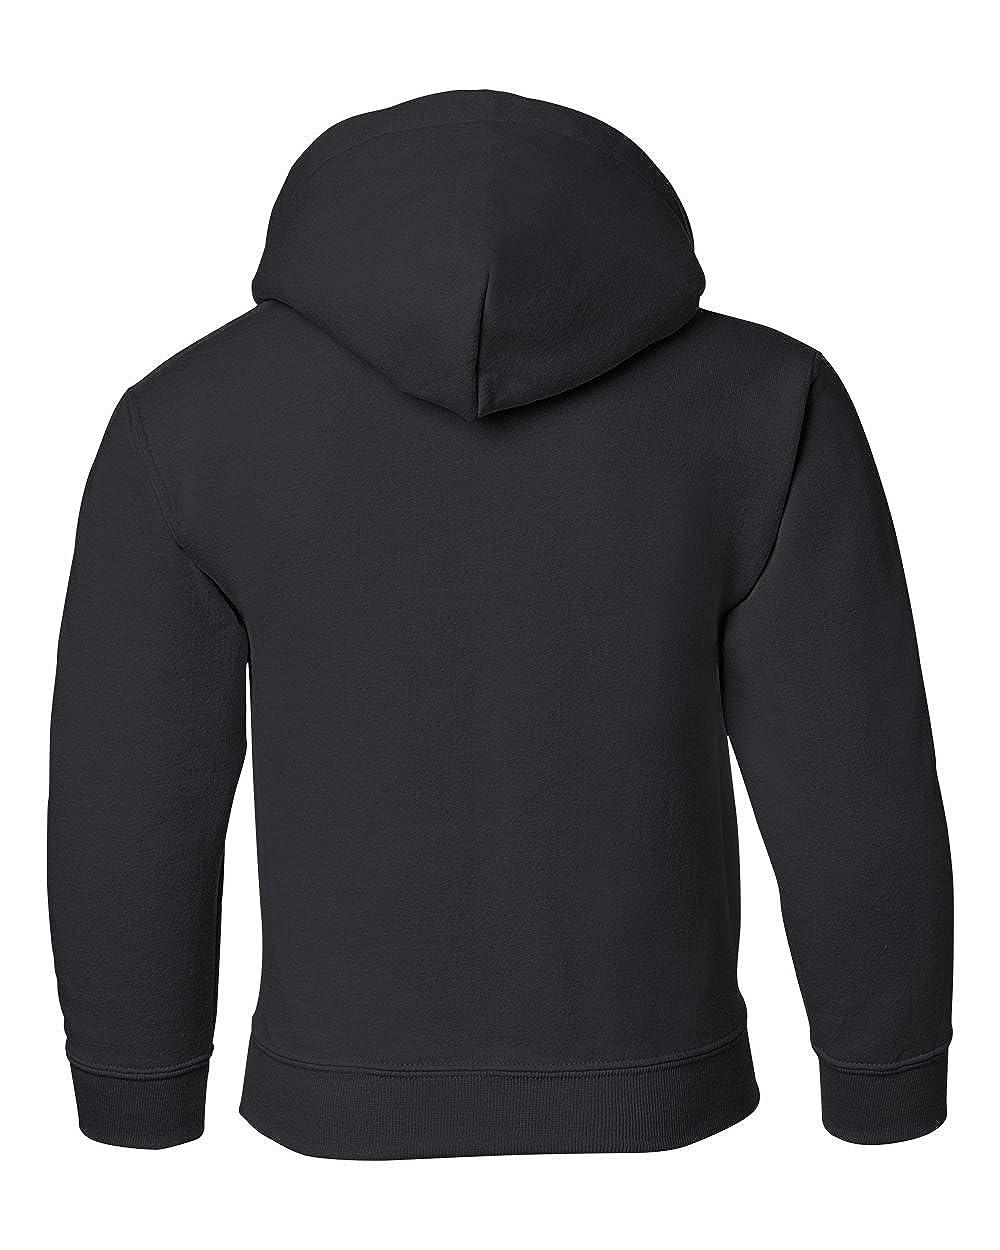 Gildan Heavy Blend Youth Hooded Sweatshirt